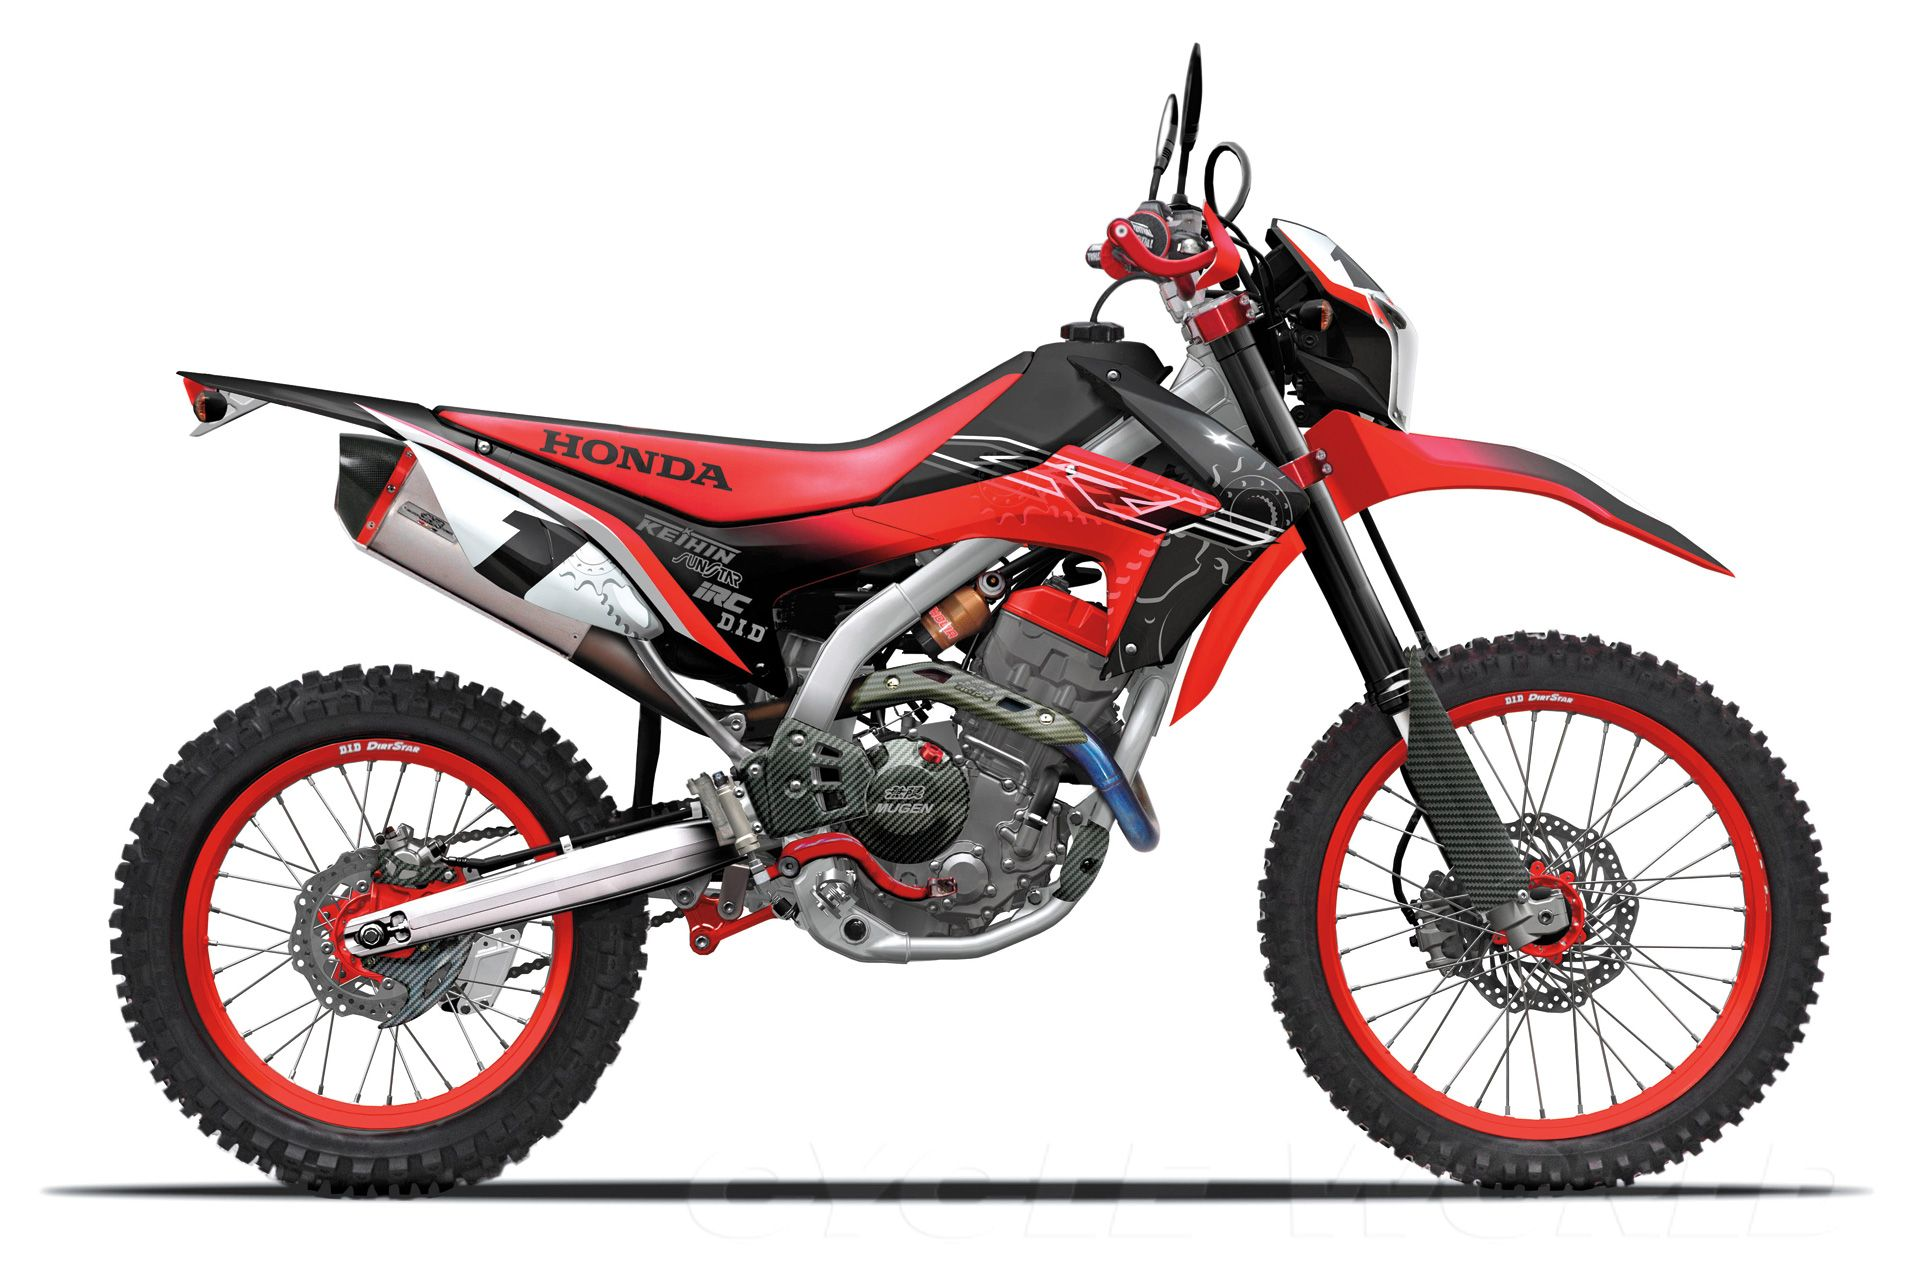 Honda Dual Sport >> Honda Crf250l Motorcycle Enduro Motorcycle Motorcycle